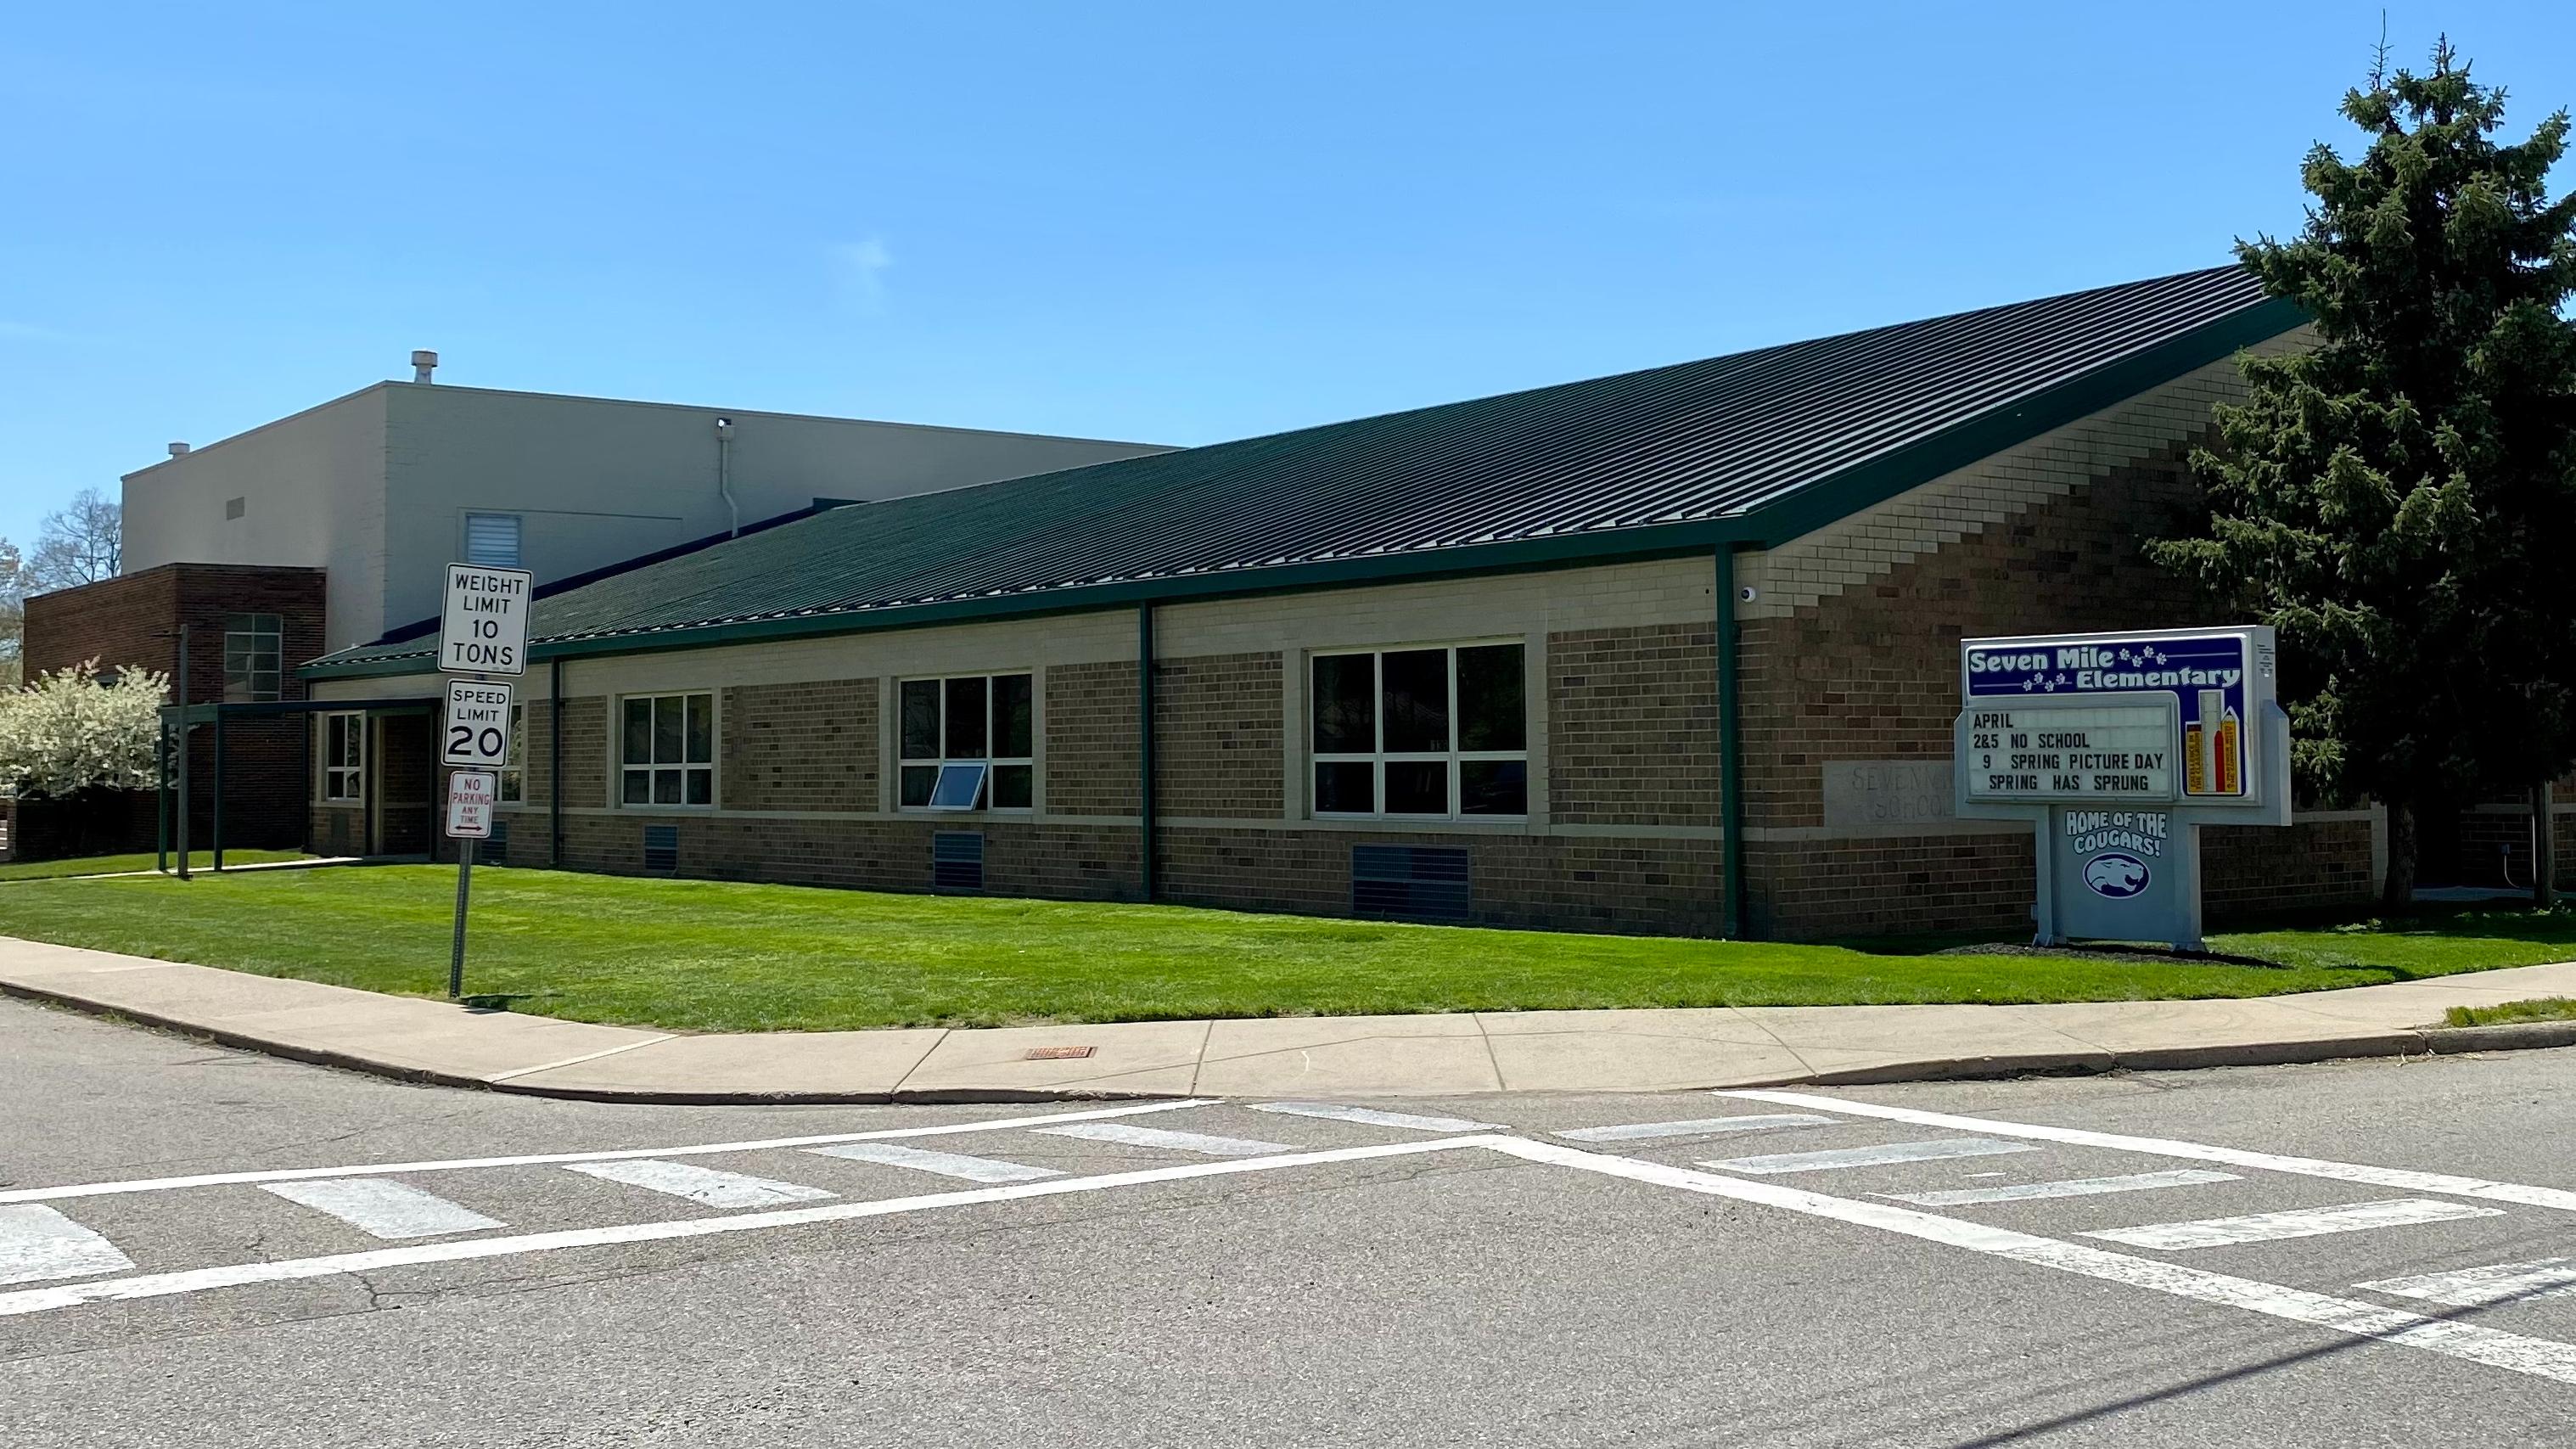 Seven Mile Elementary